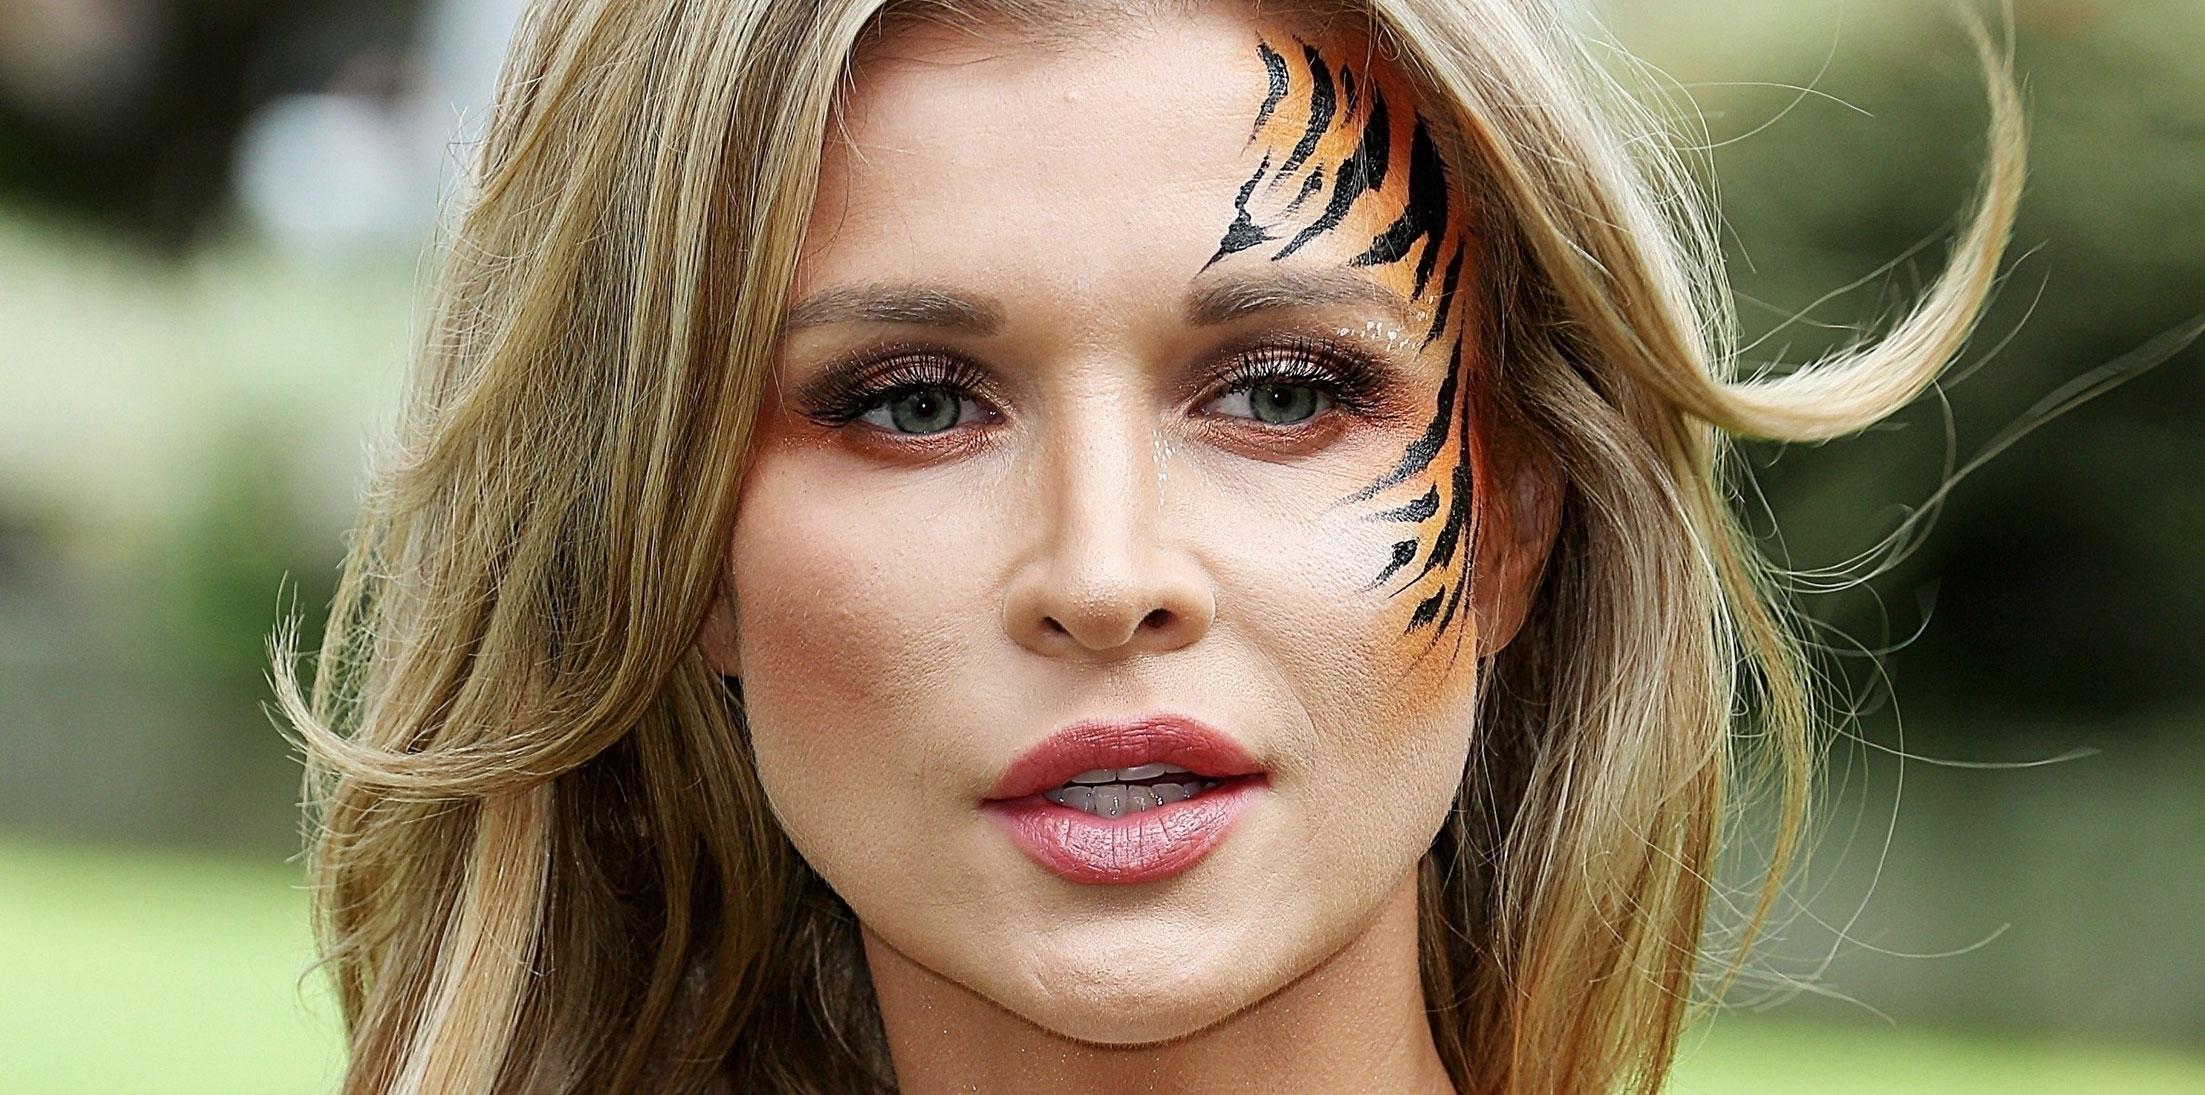 Joanna Krupa Goes Completely Naked For PETA, Speaks Out